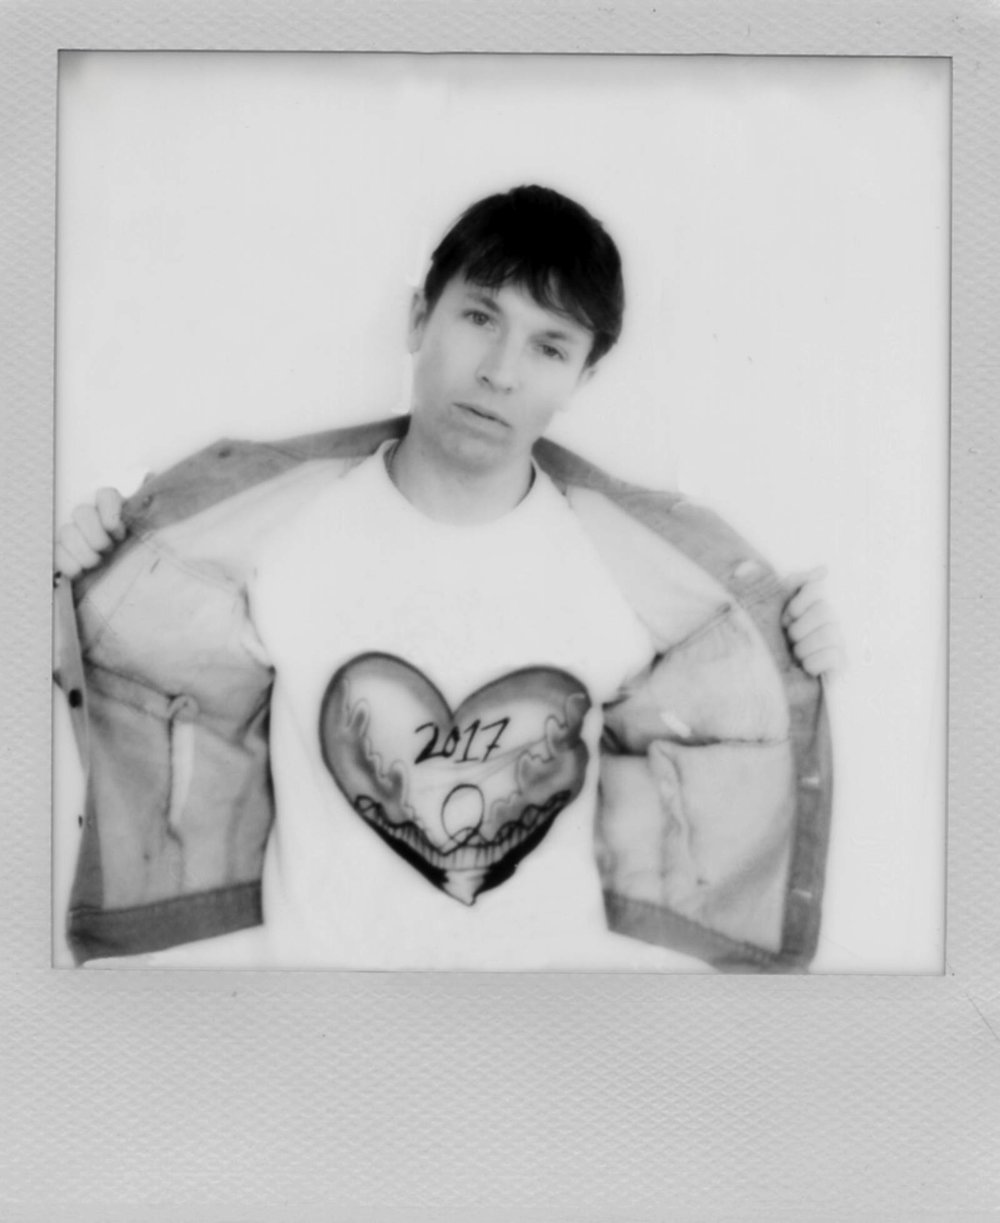 Return of the #PolaroidOriginals - By Gabriela Serpa